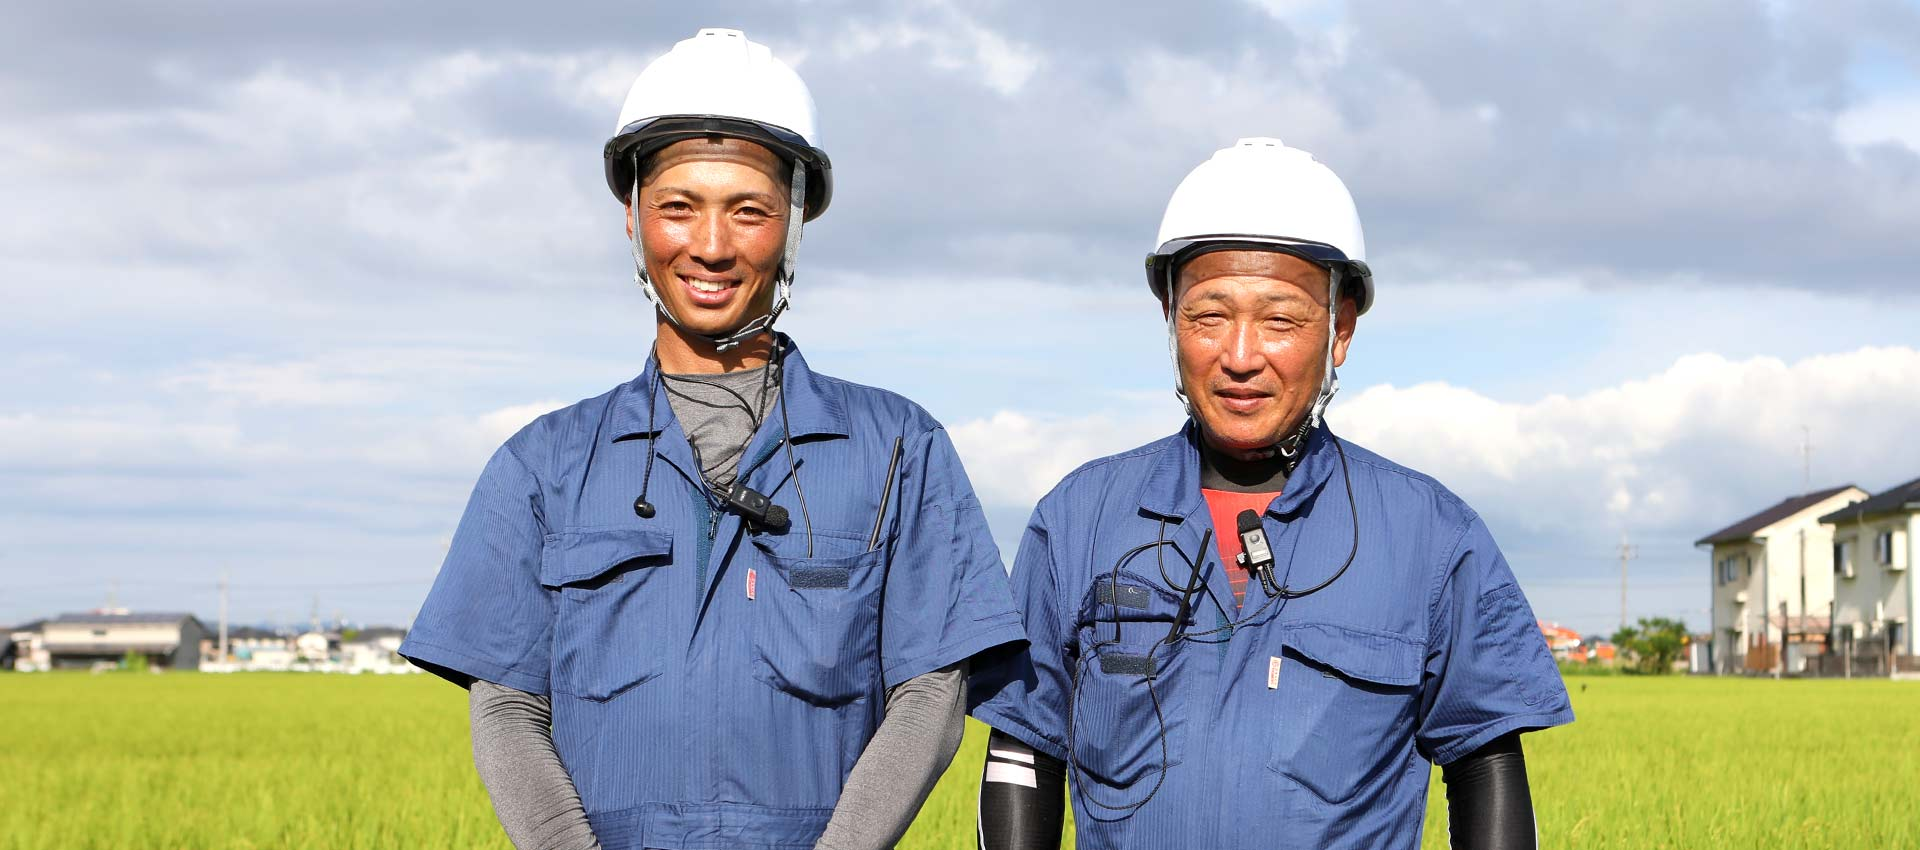 Nakashin・ナカシン・中心|ドローン岡山、ドローンスクール、調査・測量・点検・農薬散布・ソーラーパネル洗浄